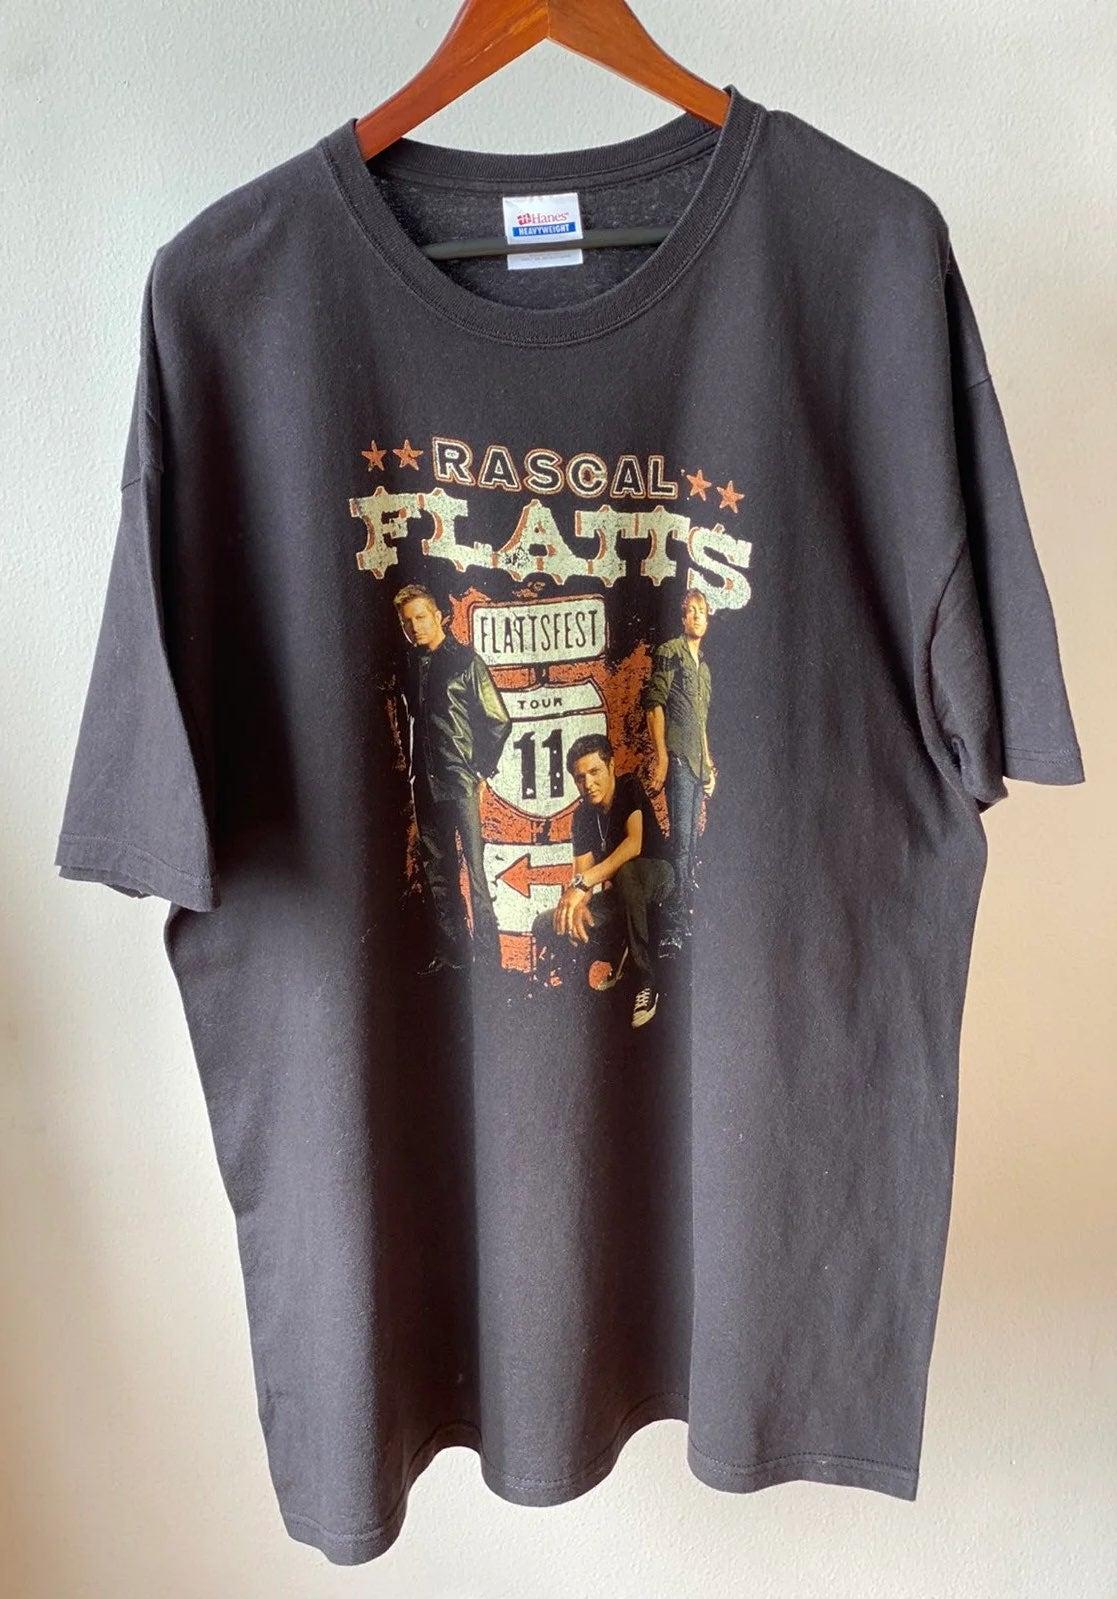 2011 Rascal Flatts Flattsfest Tour Shirt